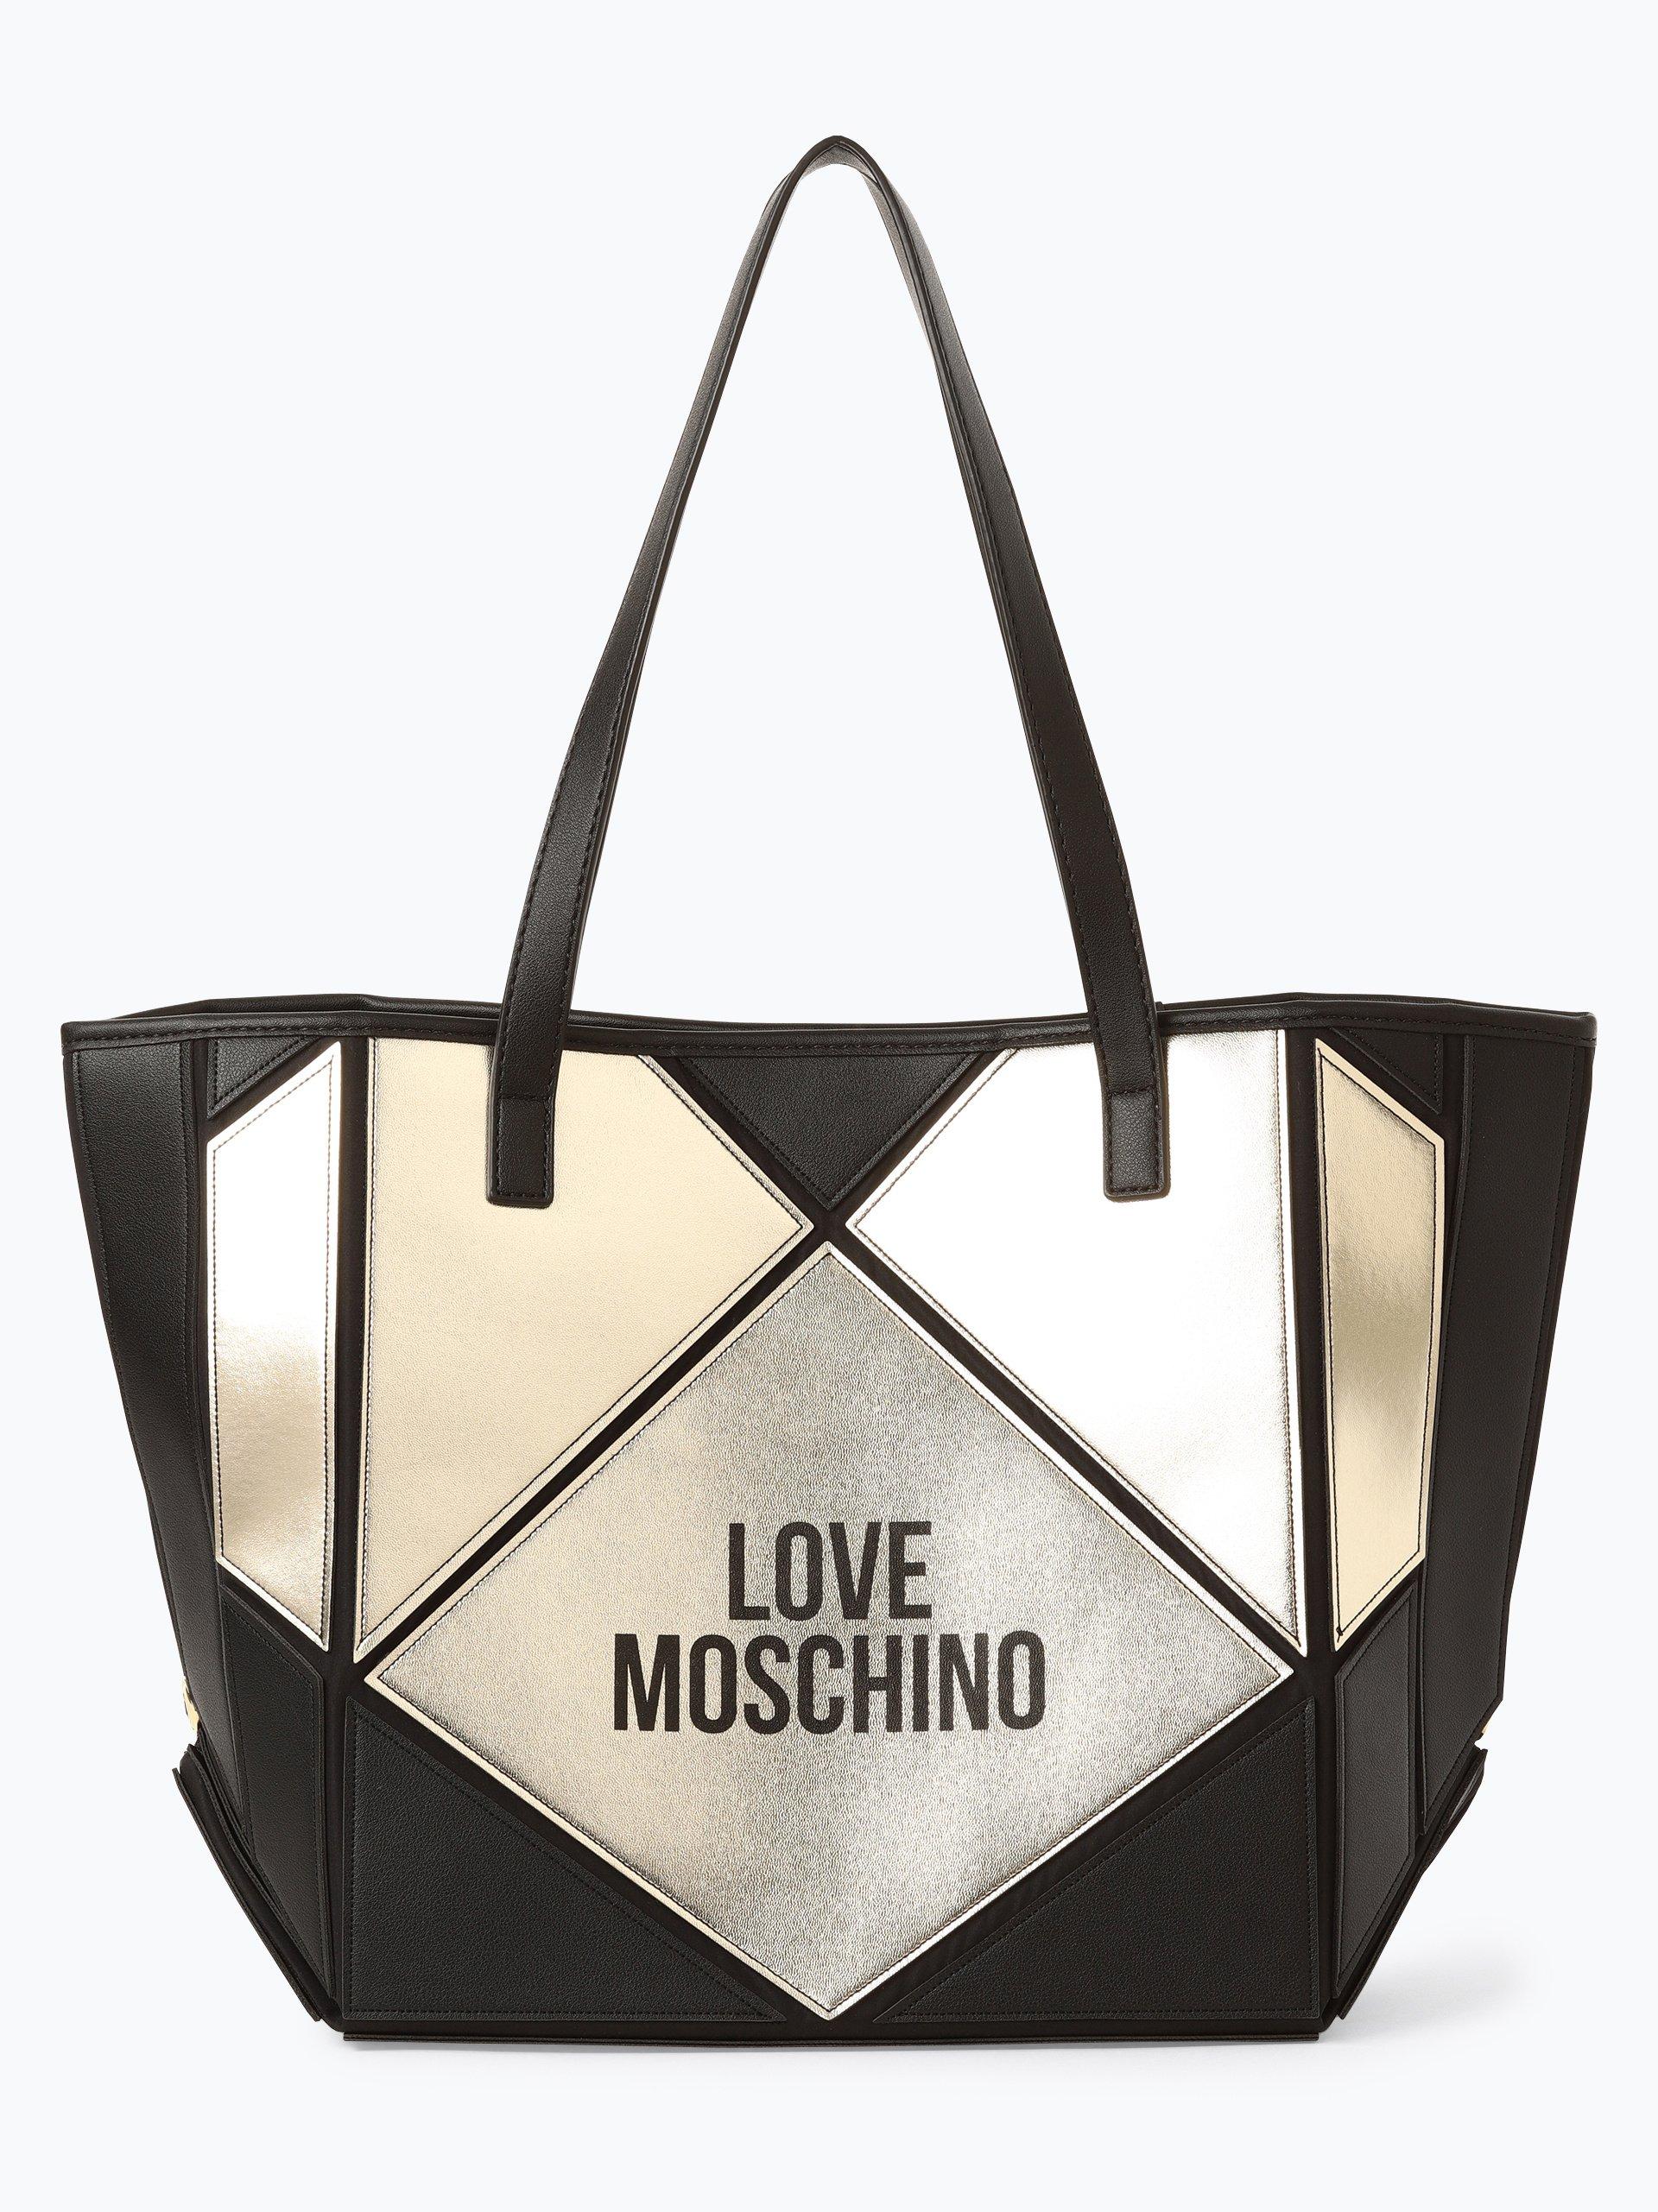 Love Moschino Damska torba shopper